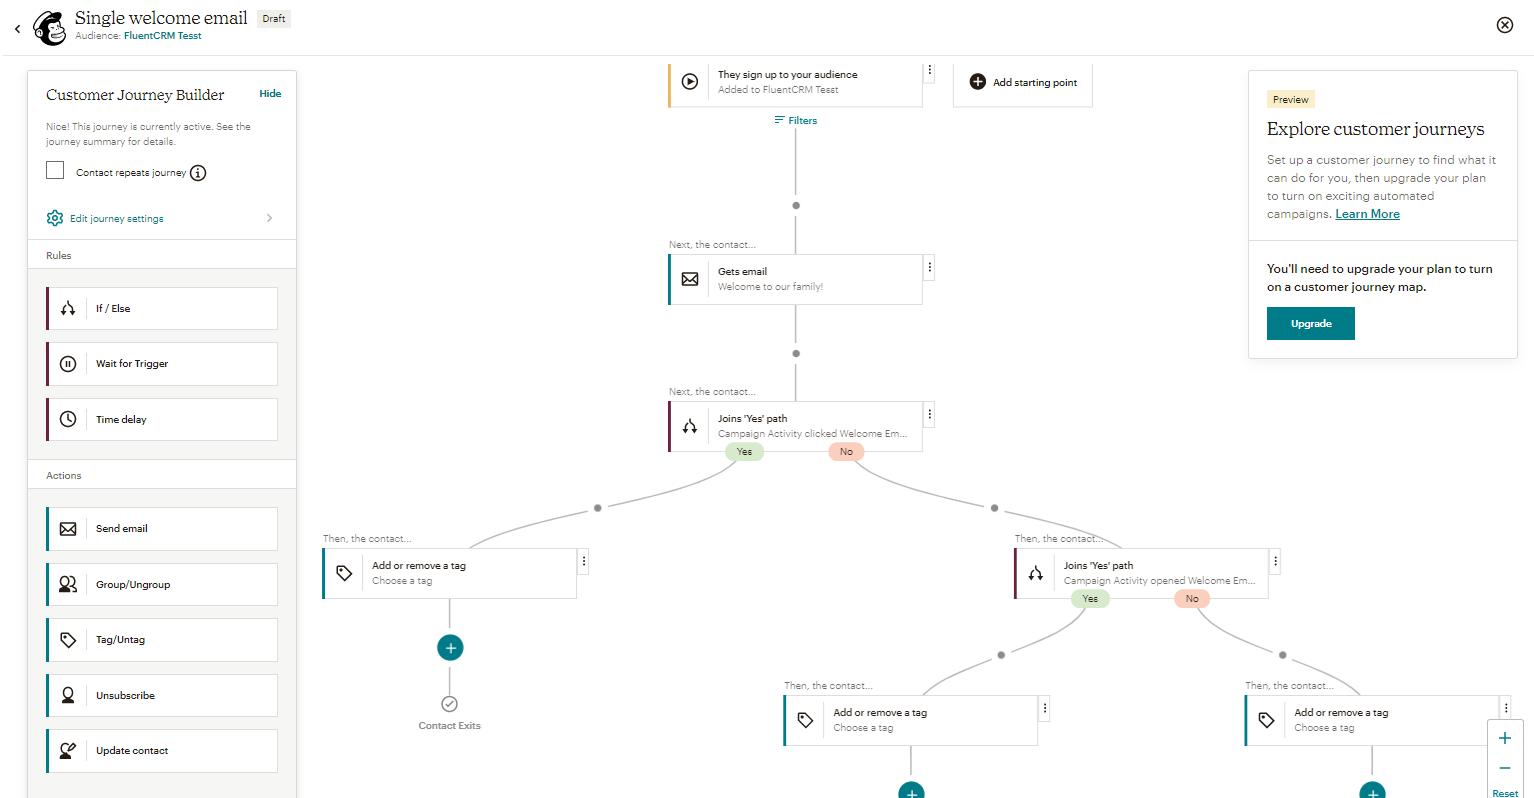 mailchimp email marketing automation builder feature